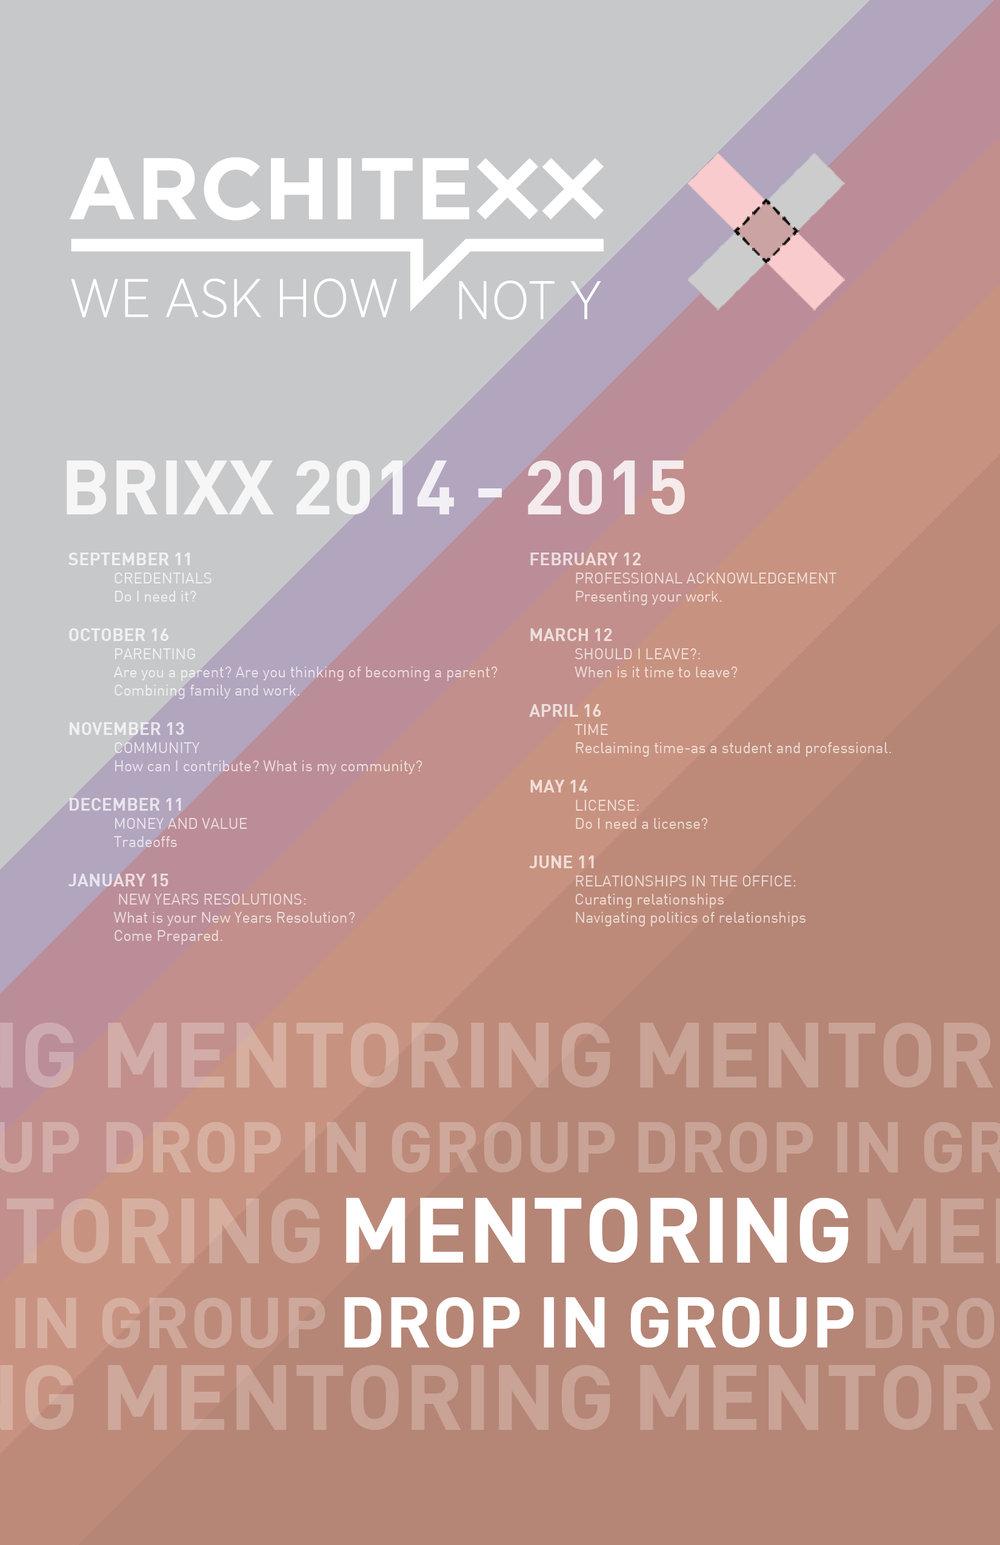 Mentoring-2014-poster-01-3.jpg